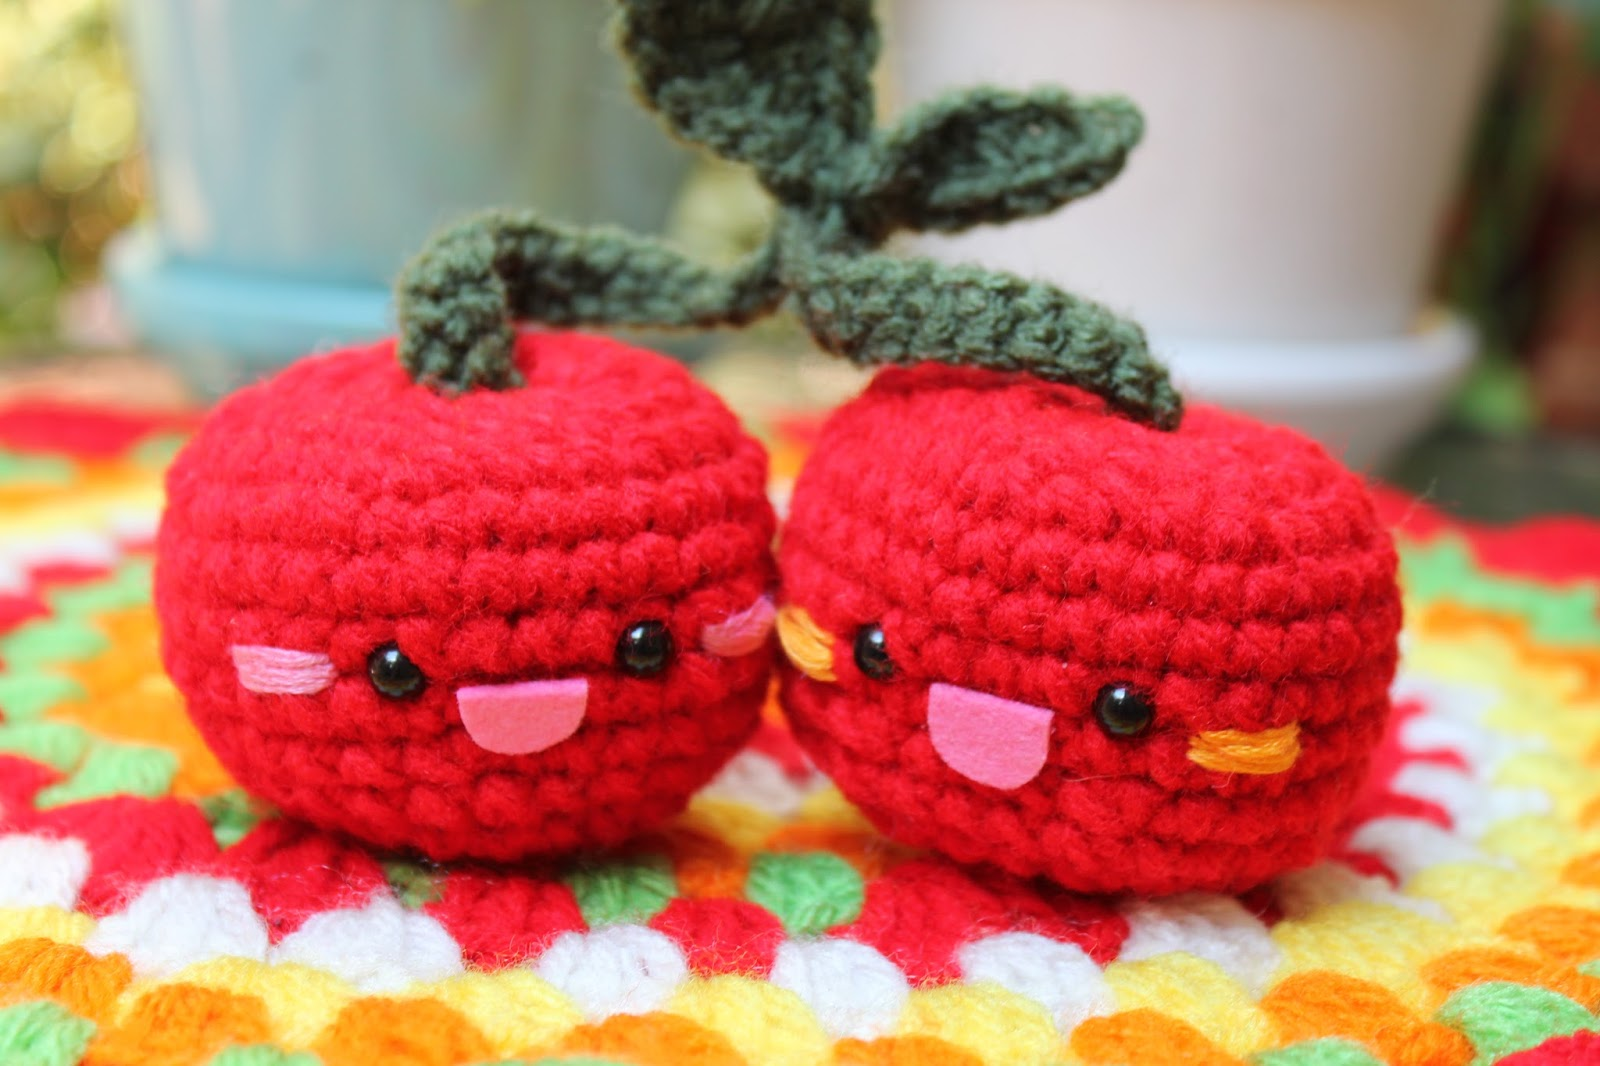 Amigurumi Food : Amigurumi Food: Cherry Amigurumi